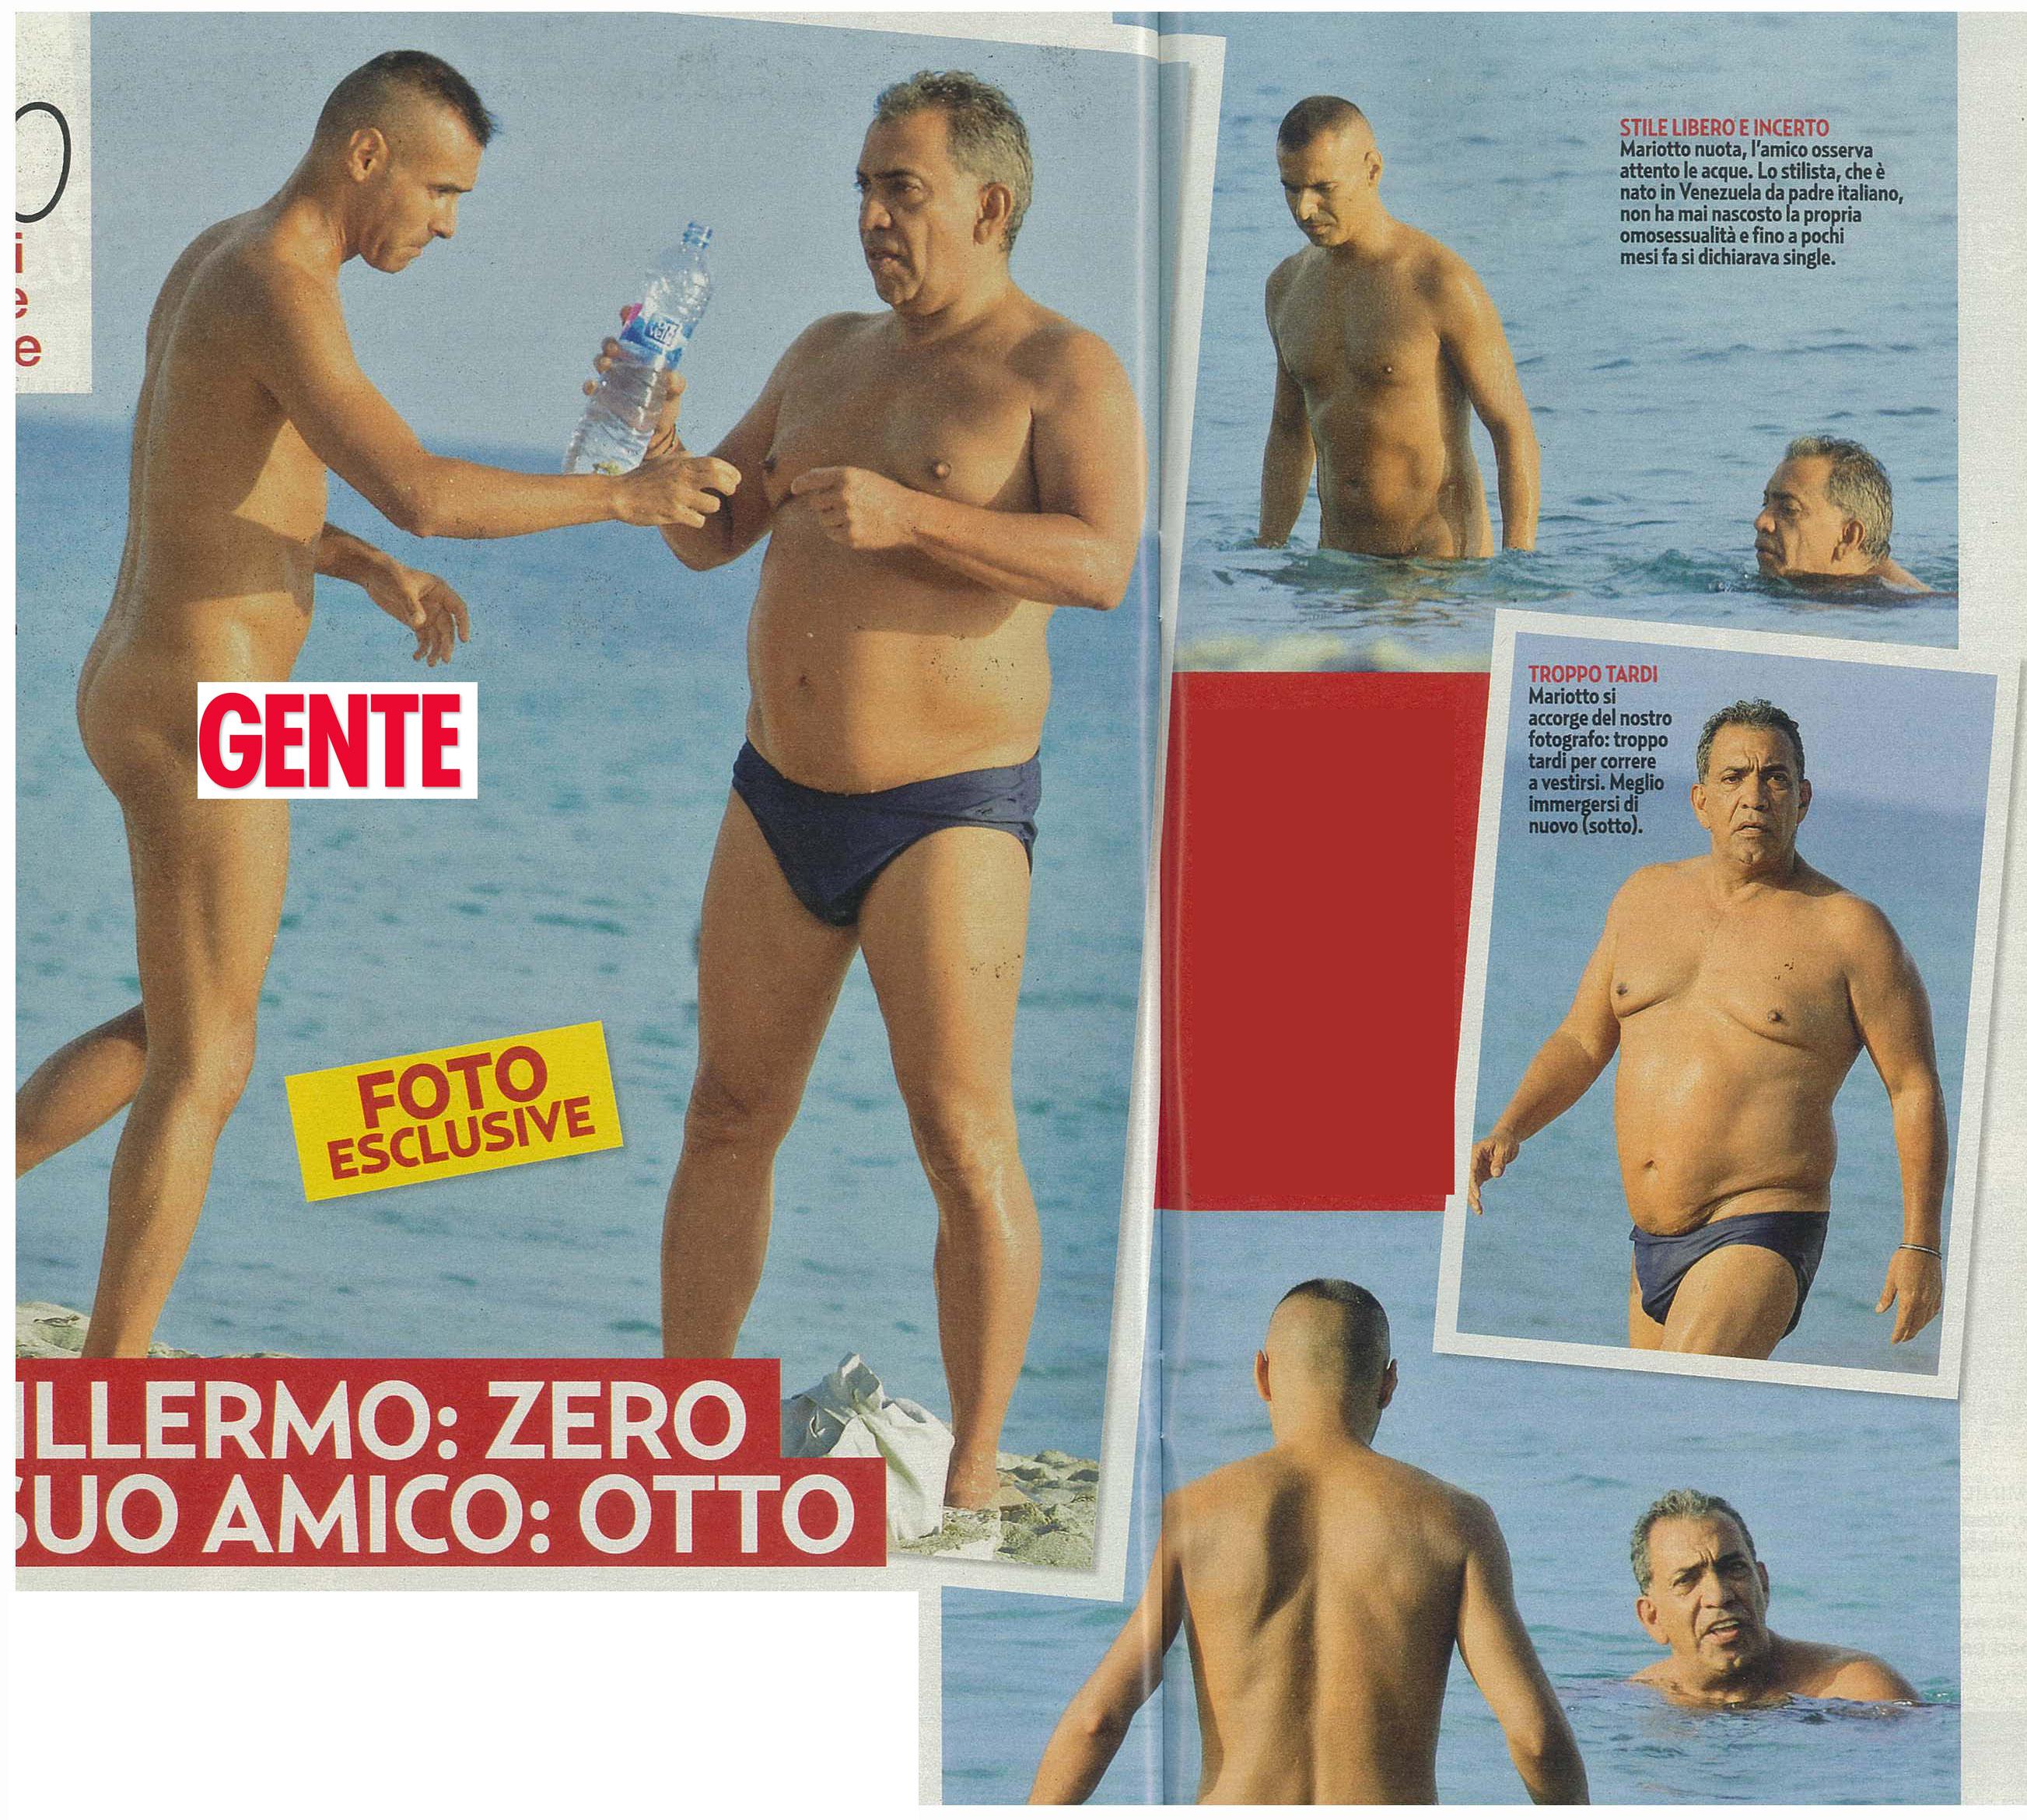 Gulliermo Mariotto